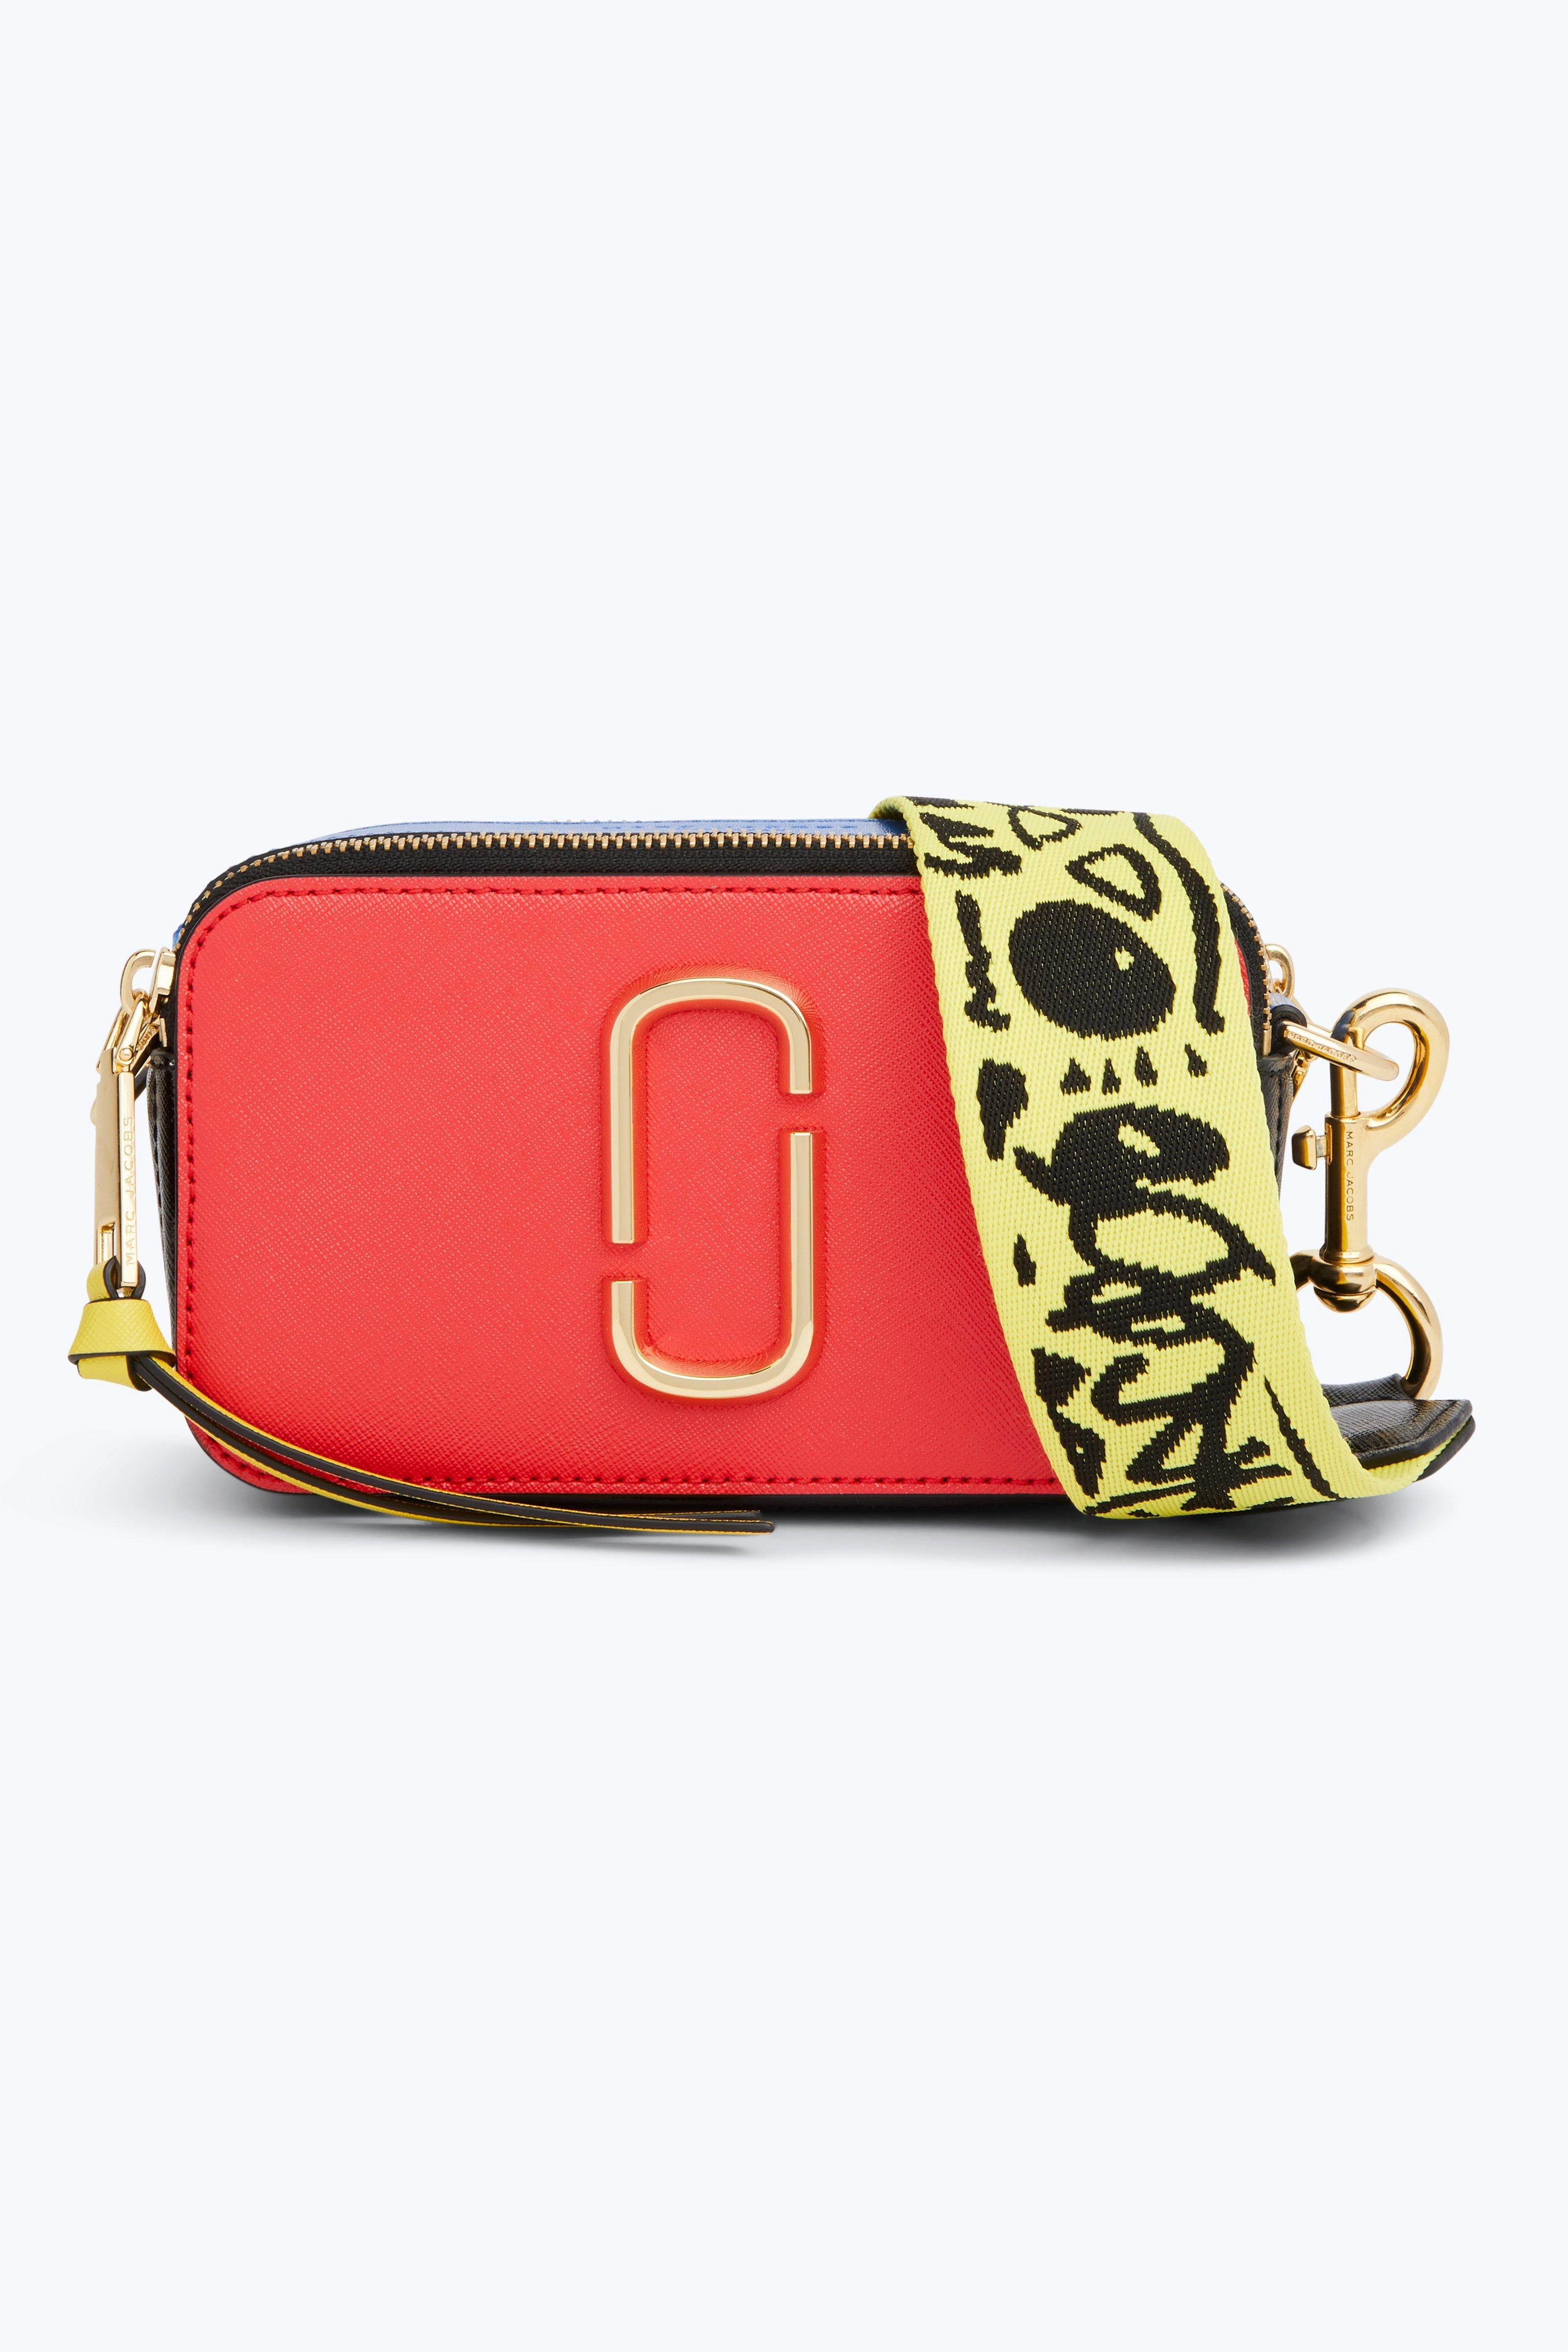 Snapshot Color-Block Textured-Leather Shoulder Bag, Poppy Red Multi